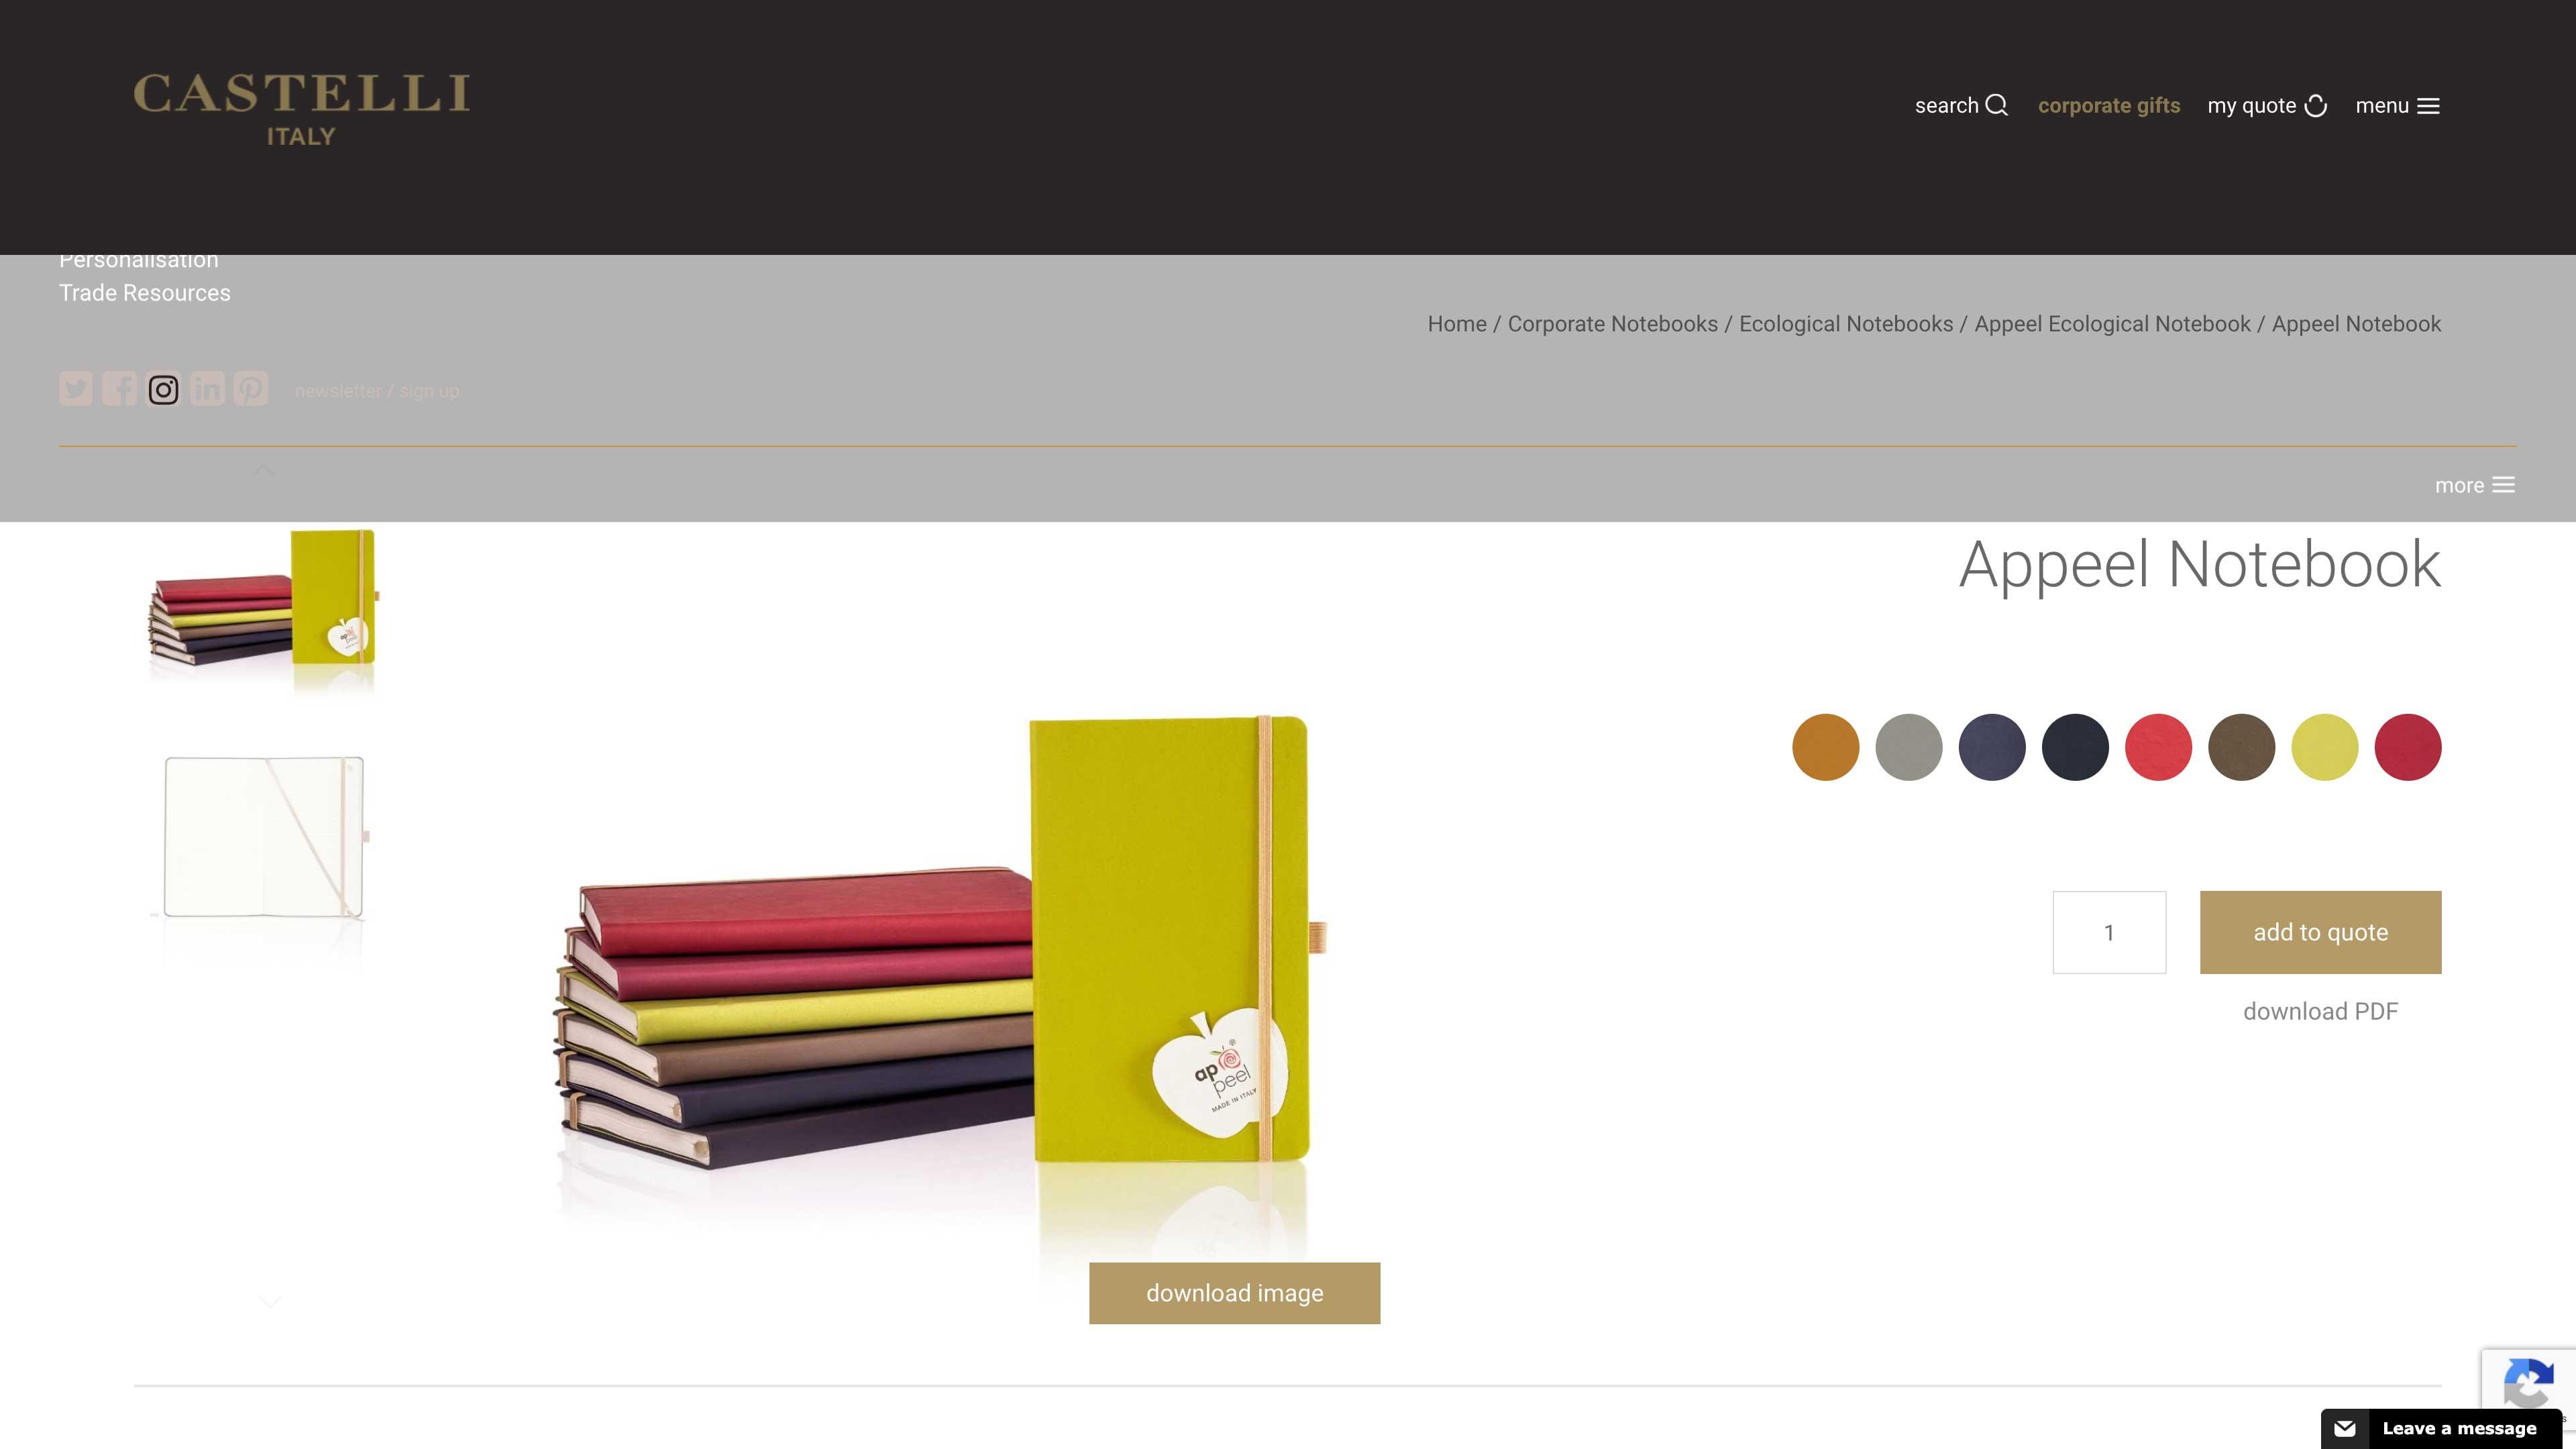 Appeel notebook website.